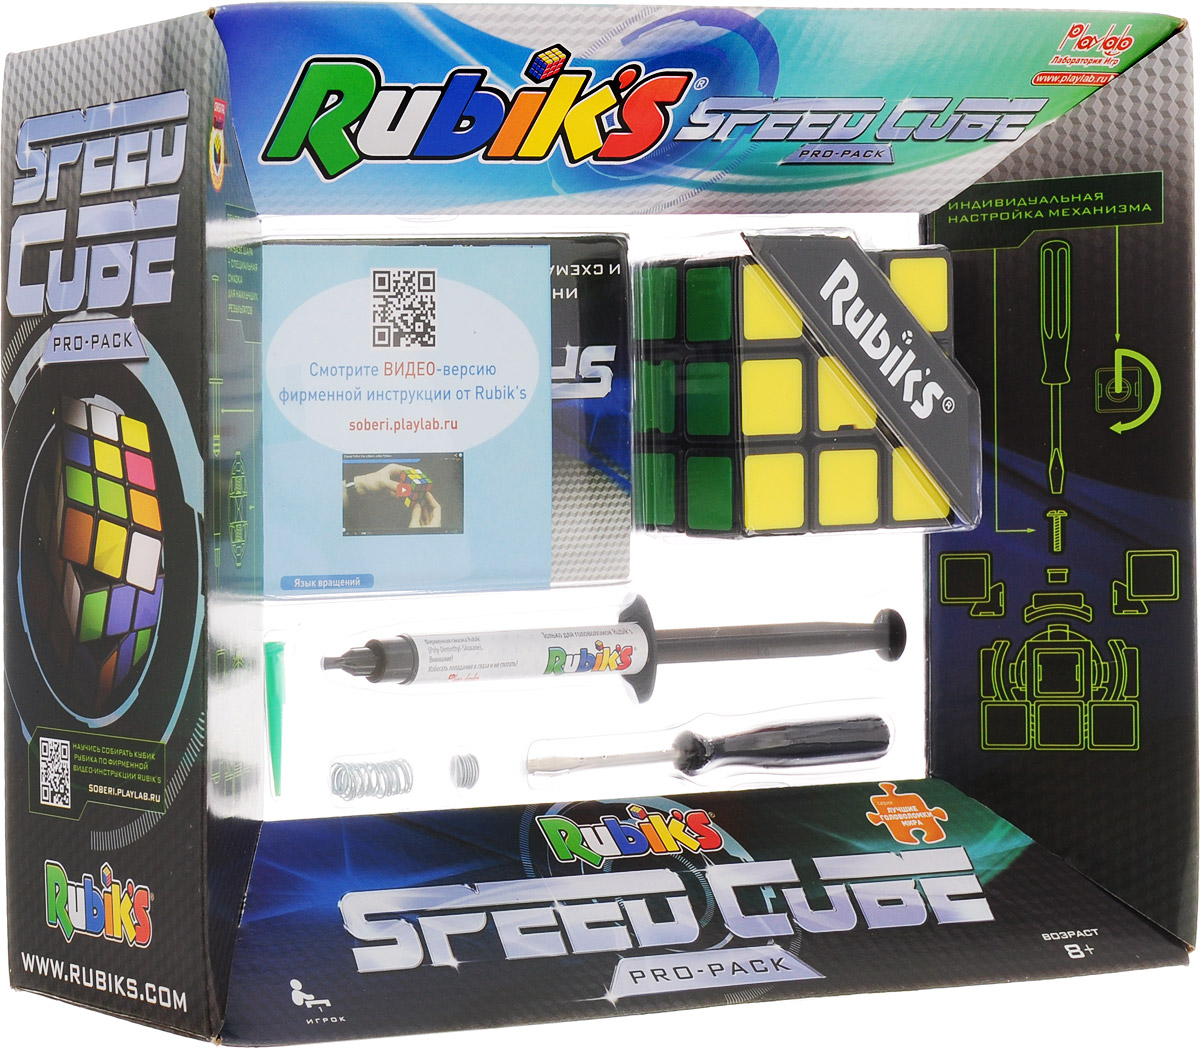 Rubik's Головоломка Скоростной кубик Рубика 3х3 rubiks головоломка кубик рубика 5х5